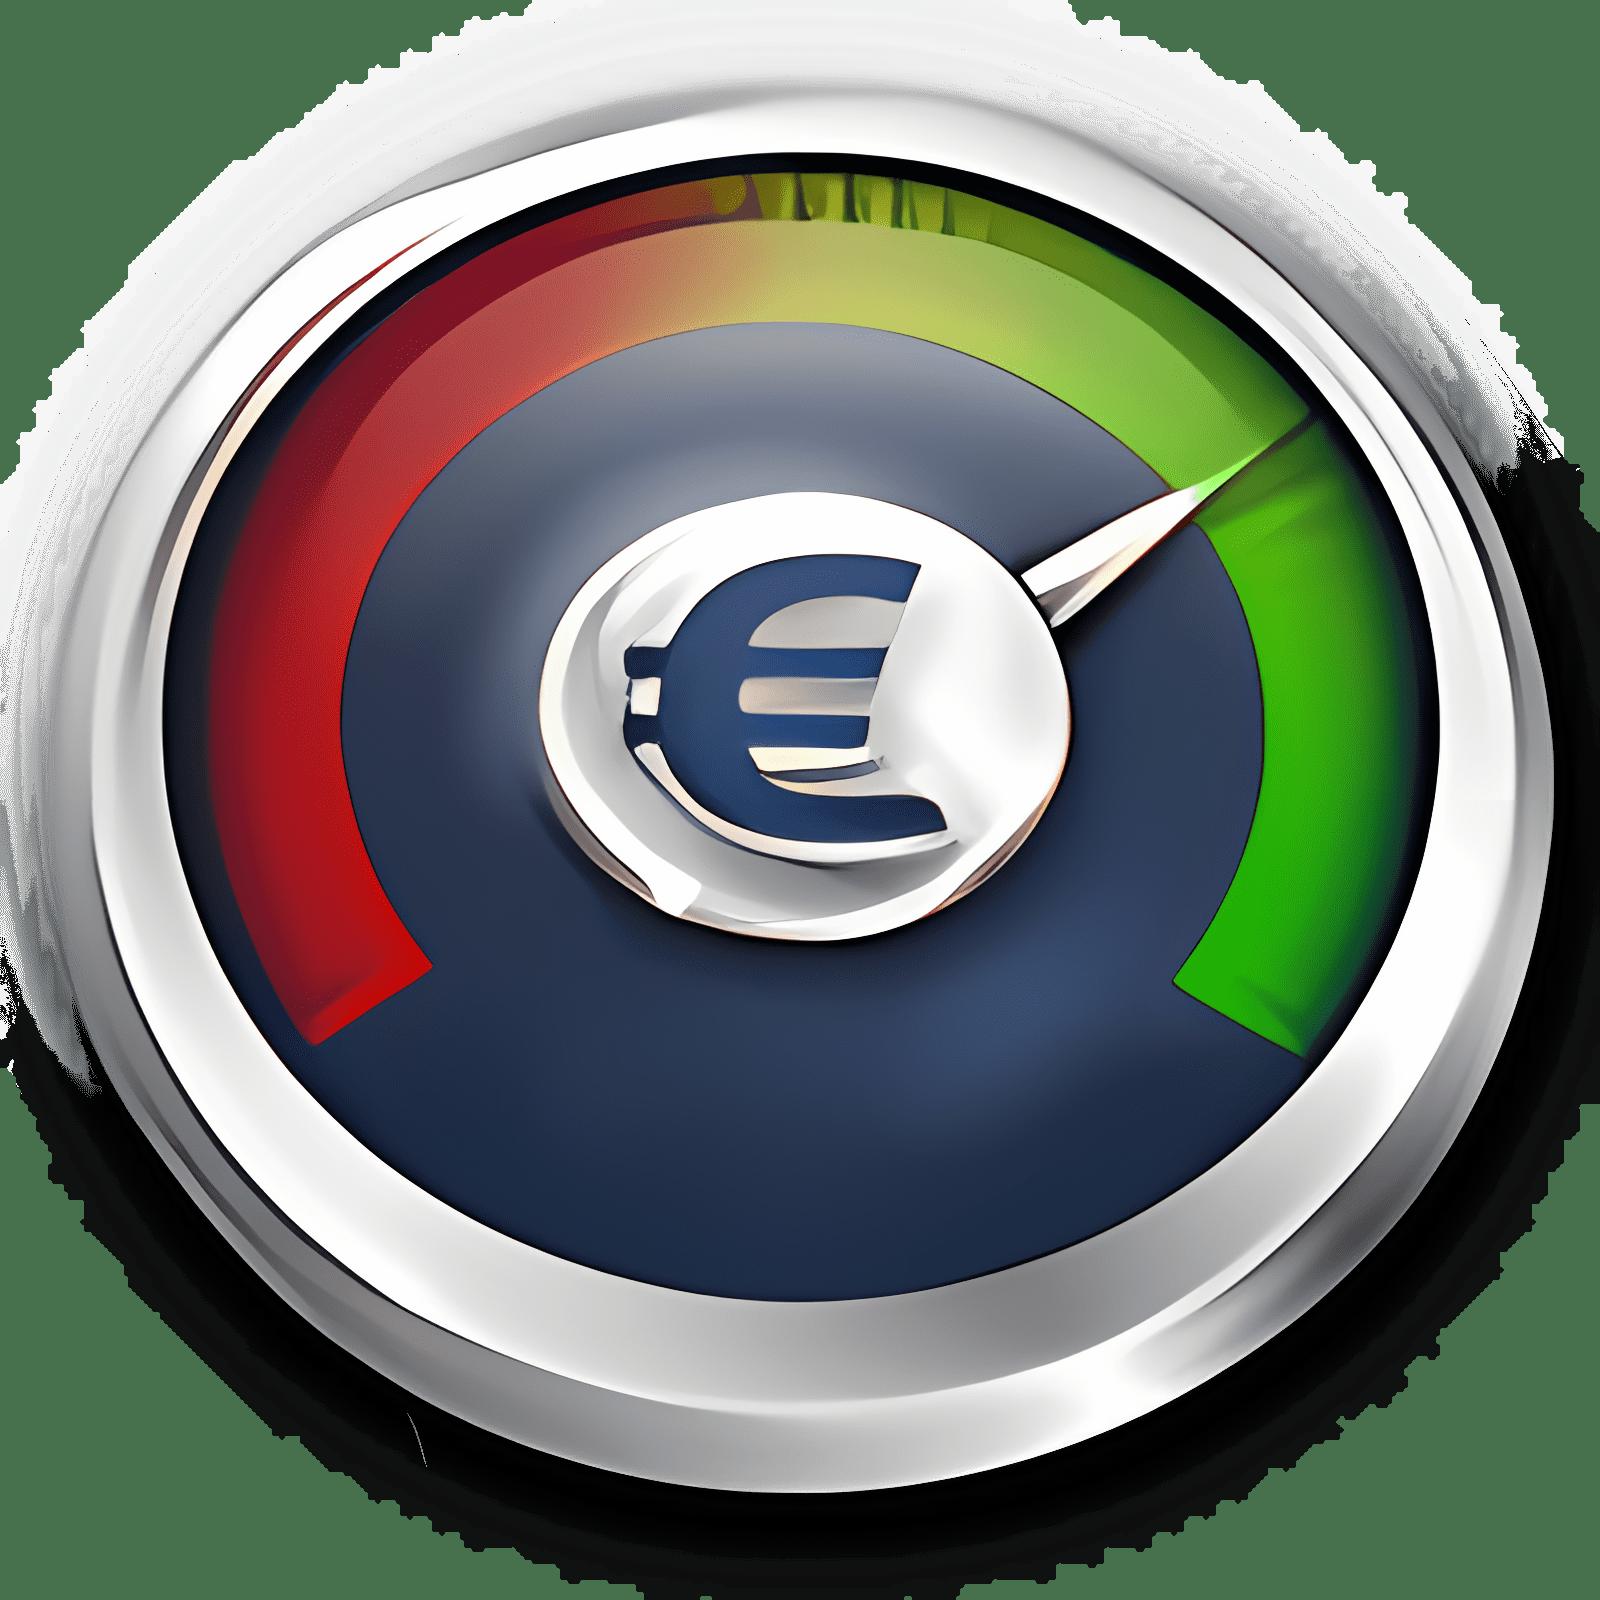 Steganos Online-Banking